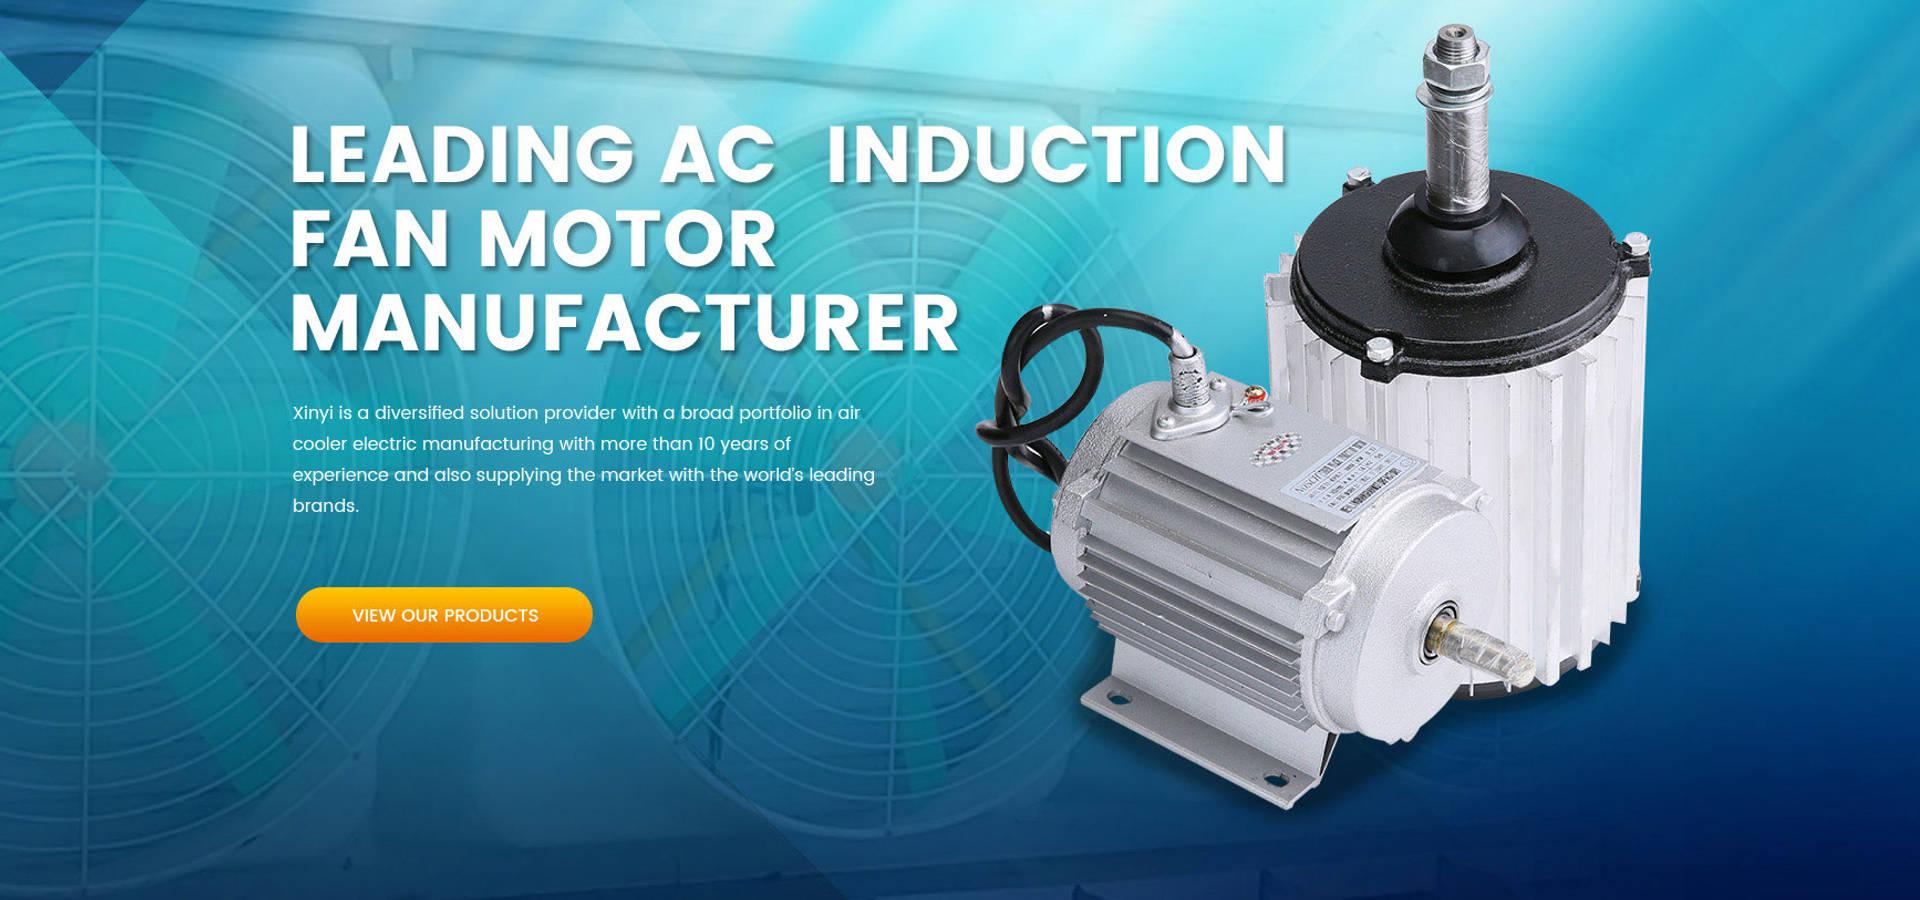 Taizhou Xinyd Machinery Co.,Ltd